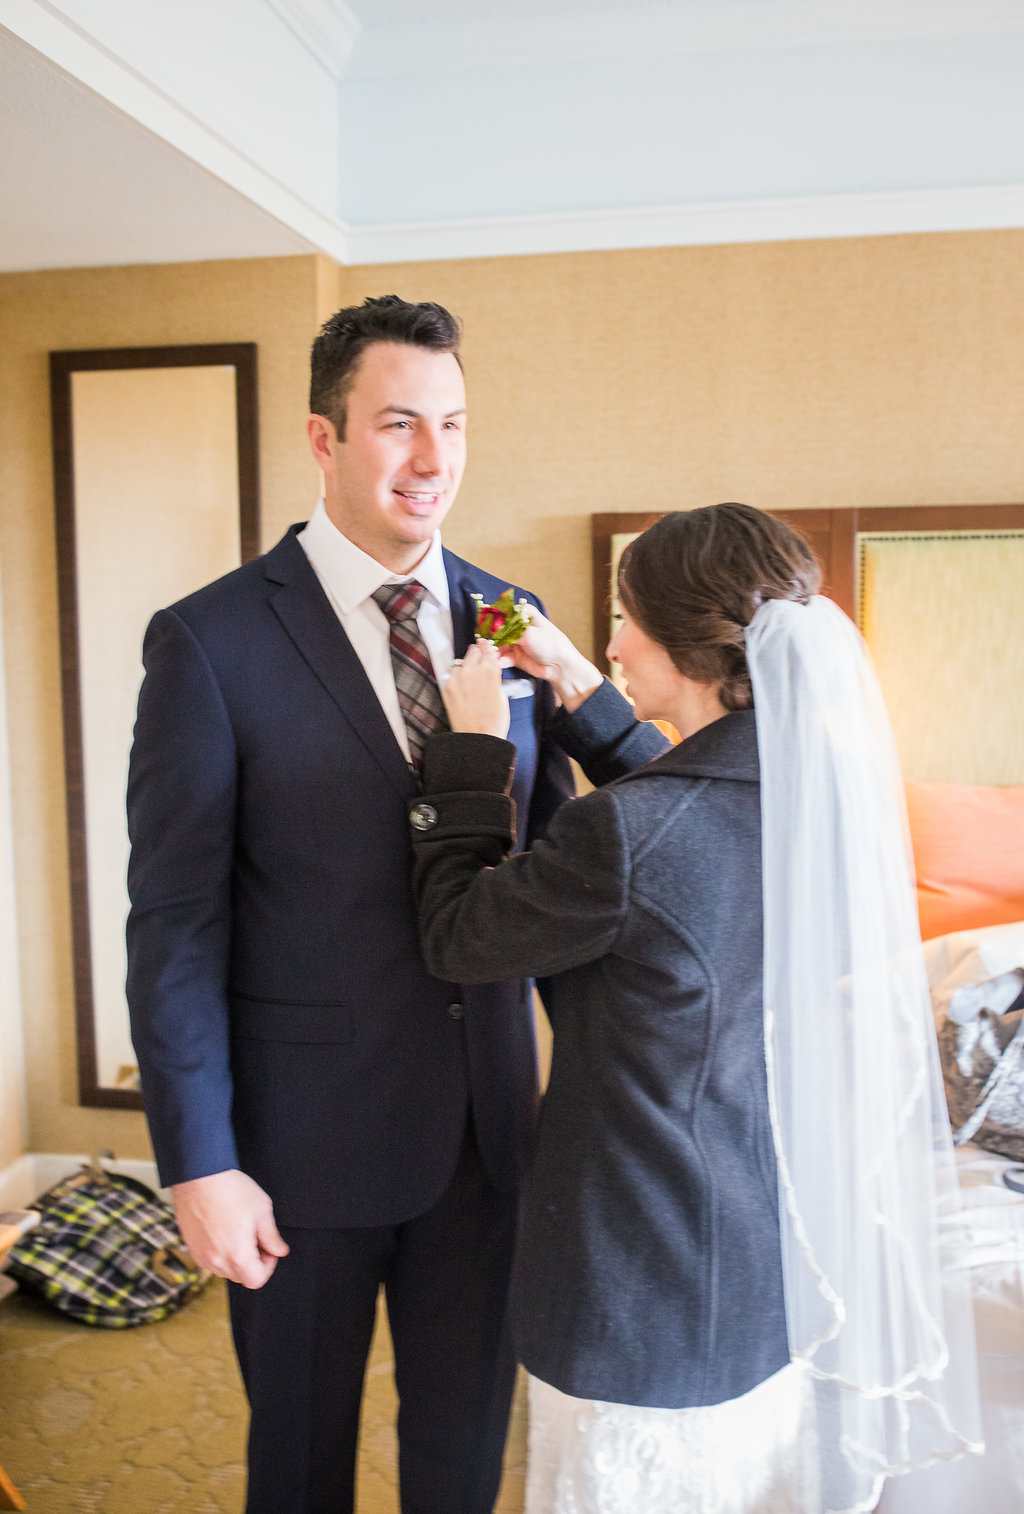 Honeysuckle-Hill-Asheville-Wedding-Venue-Chase-Chris-Elopement-60.JPG